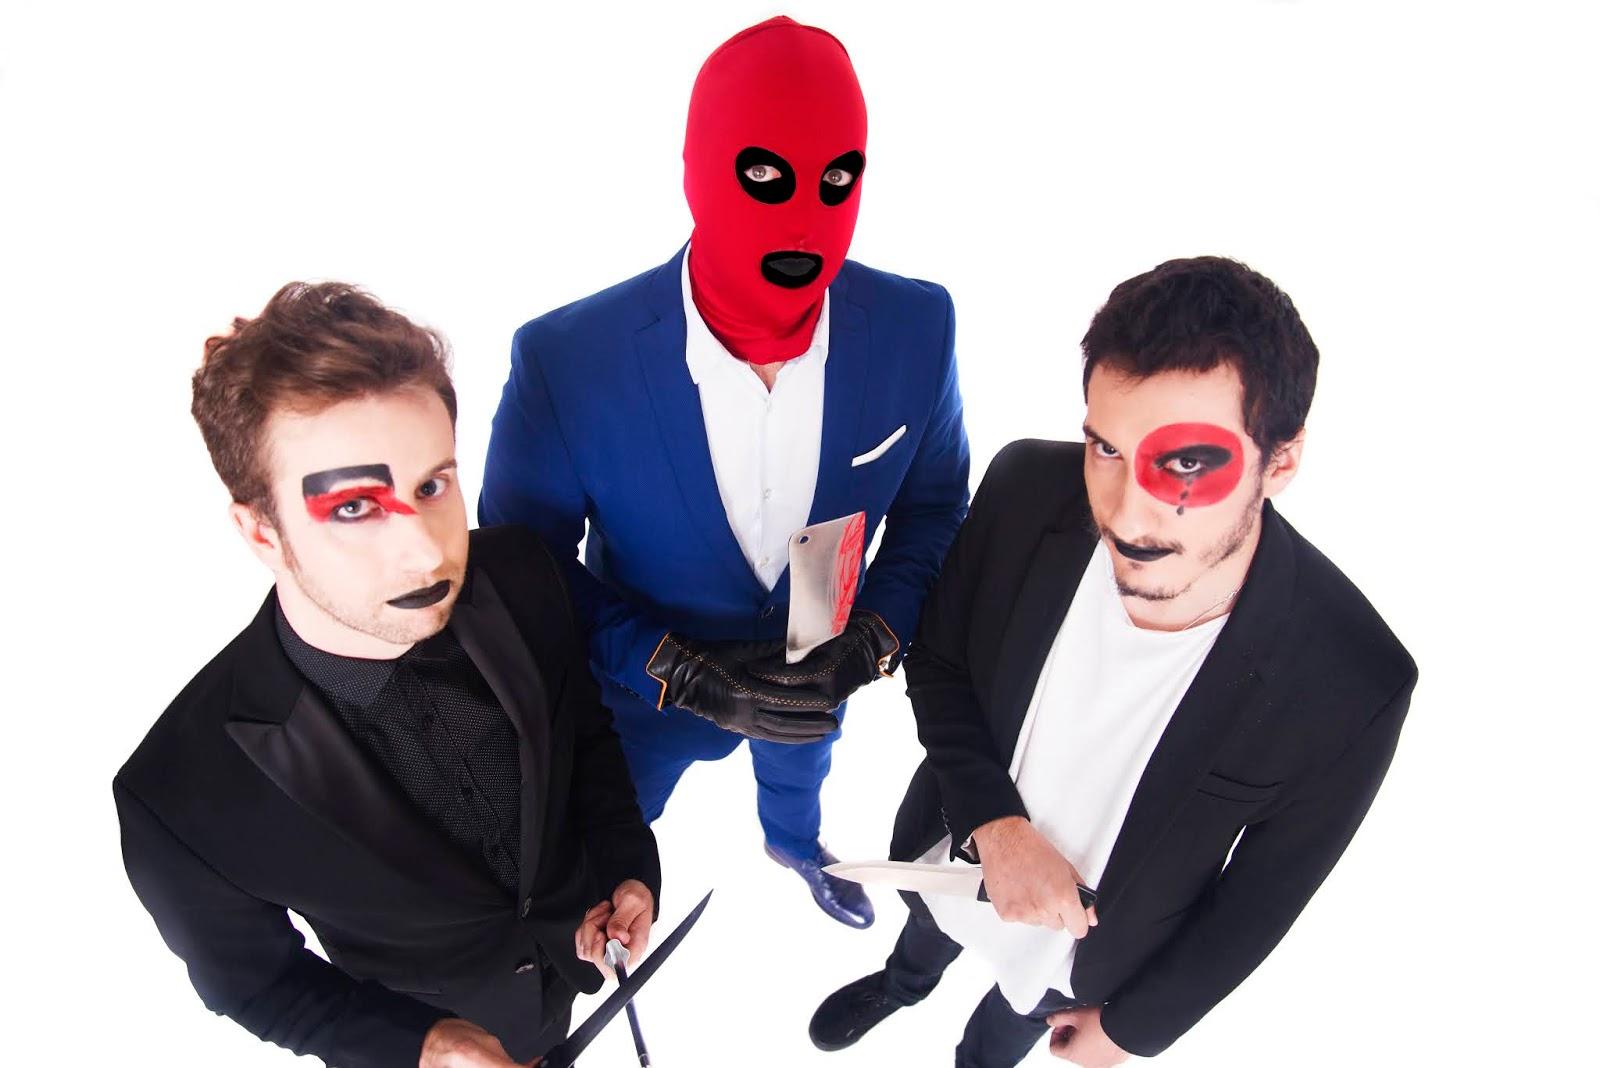 TVLVOL photo band